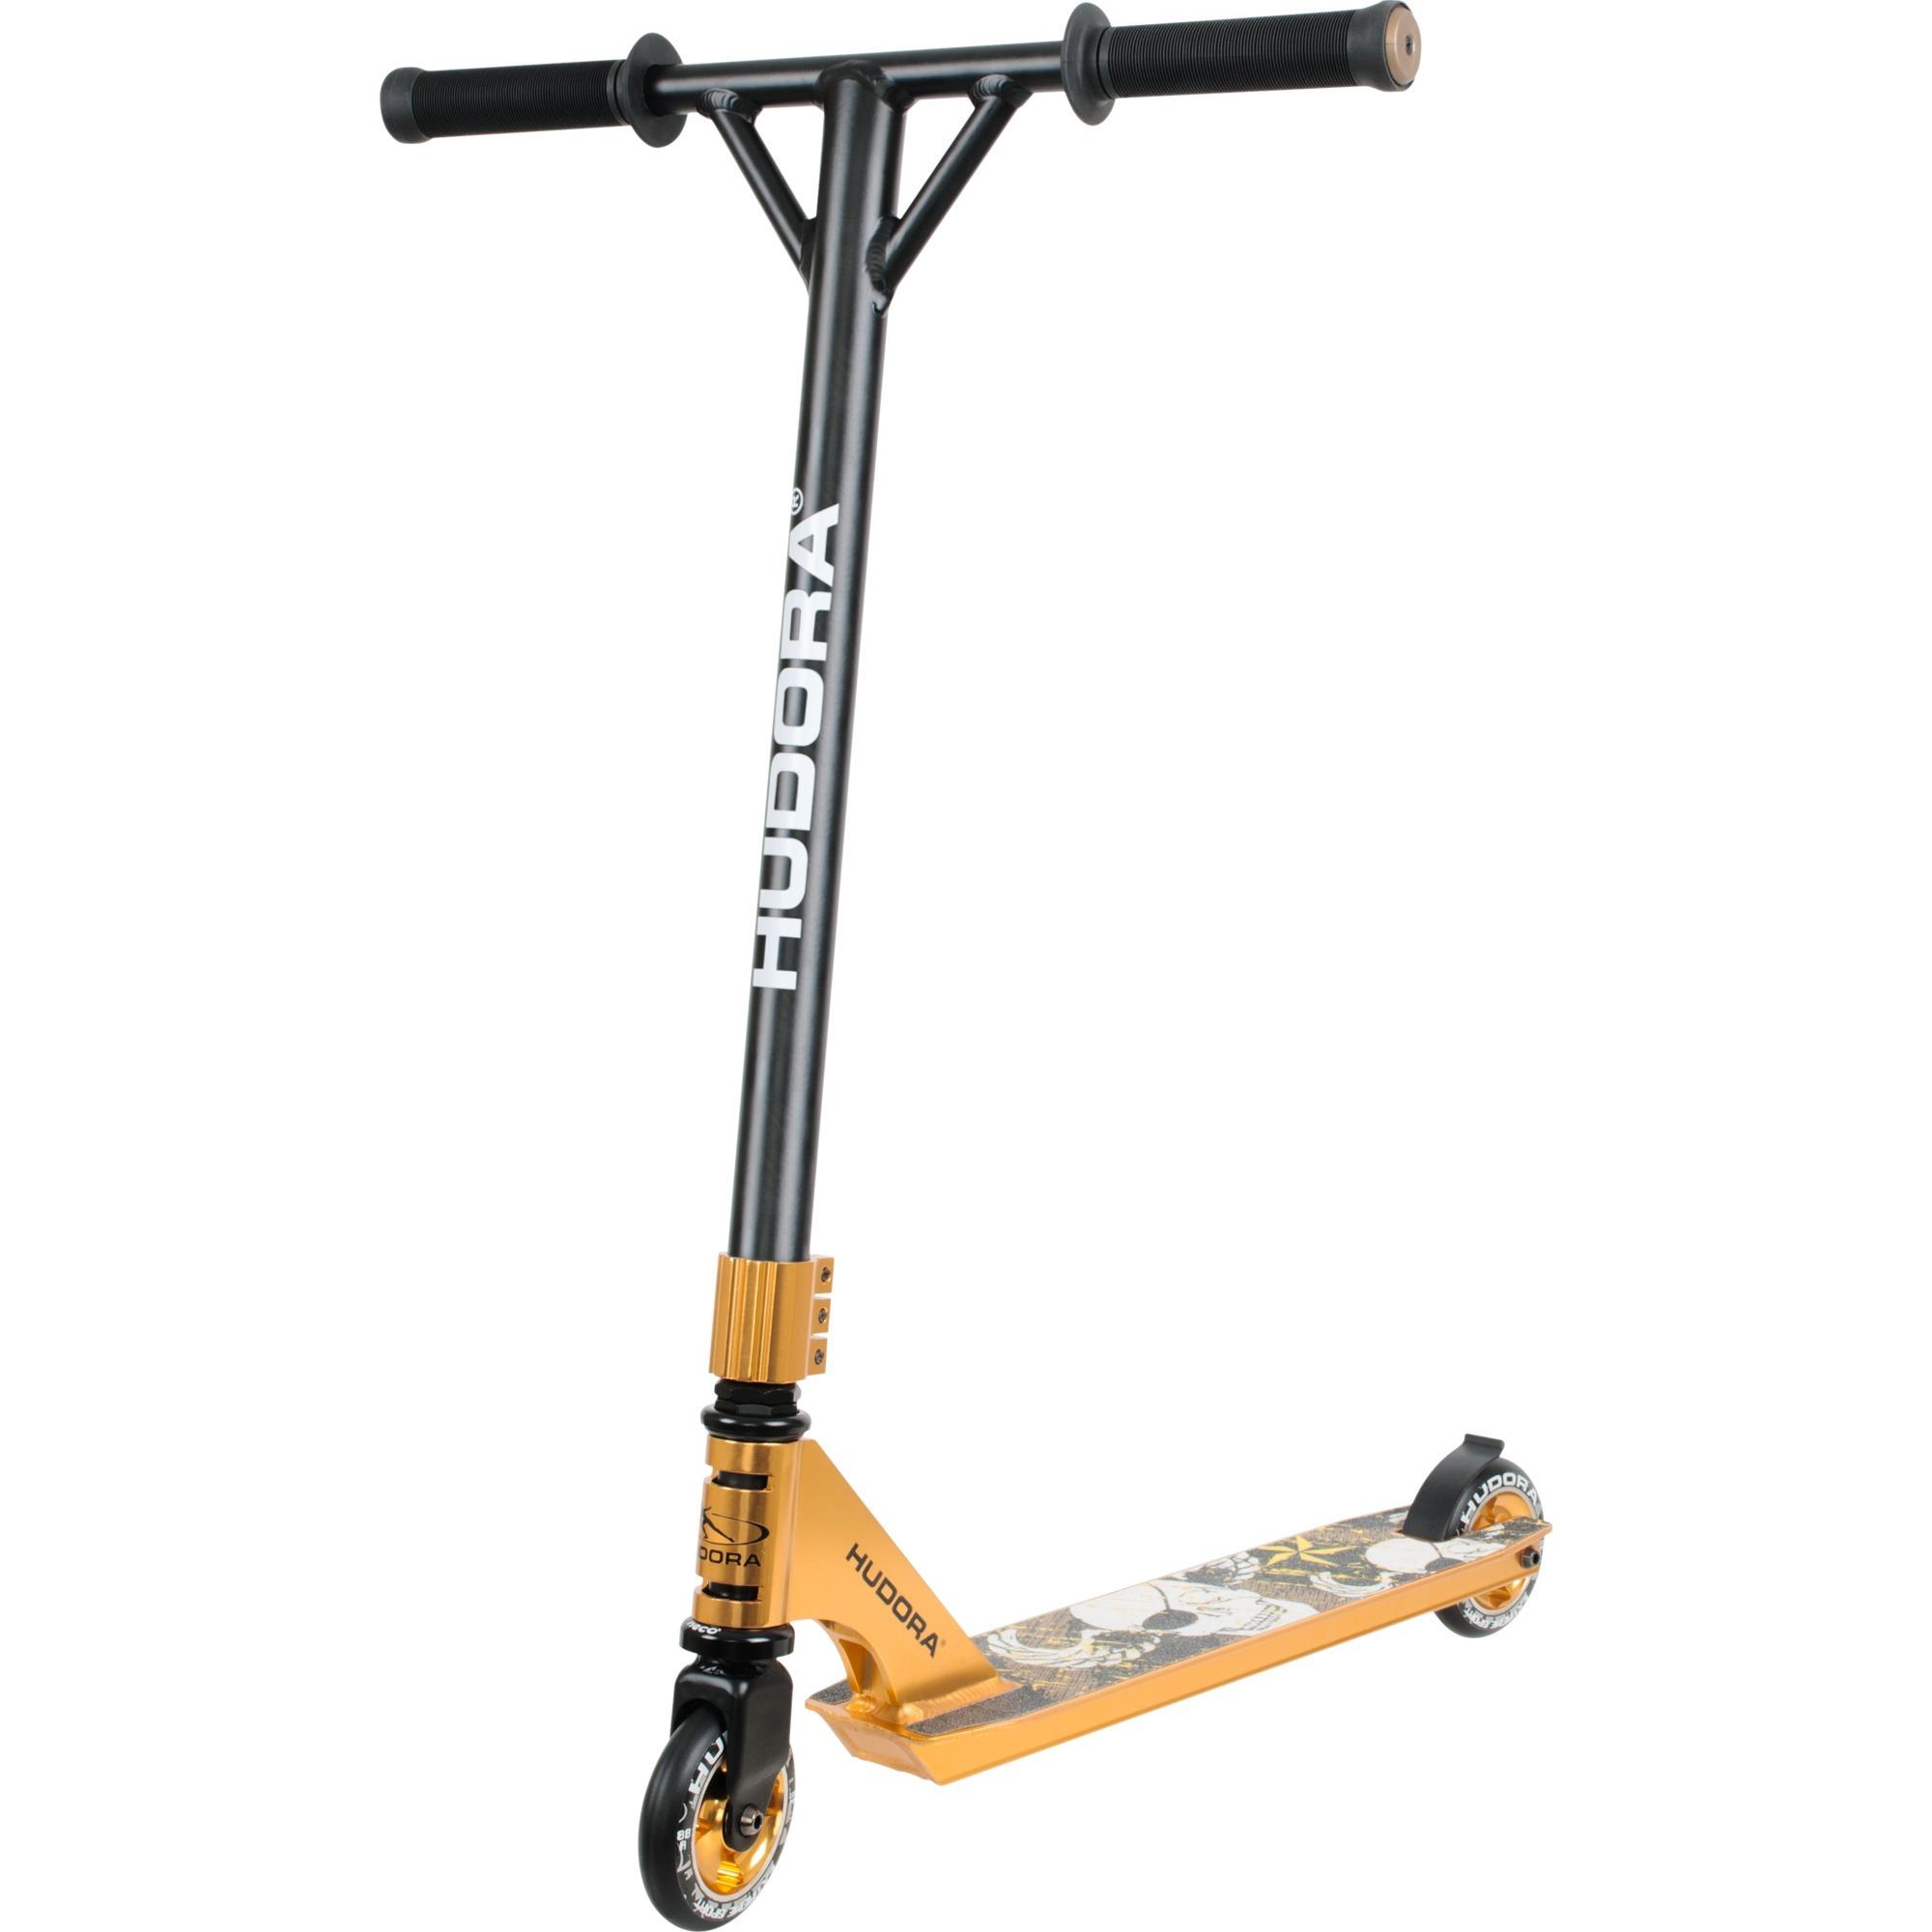 Hudora Xr Naranjanegro Scooter MulticolorVespa Adultos 25 Stunt nOwv0ymN8